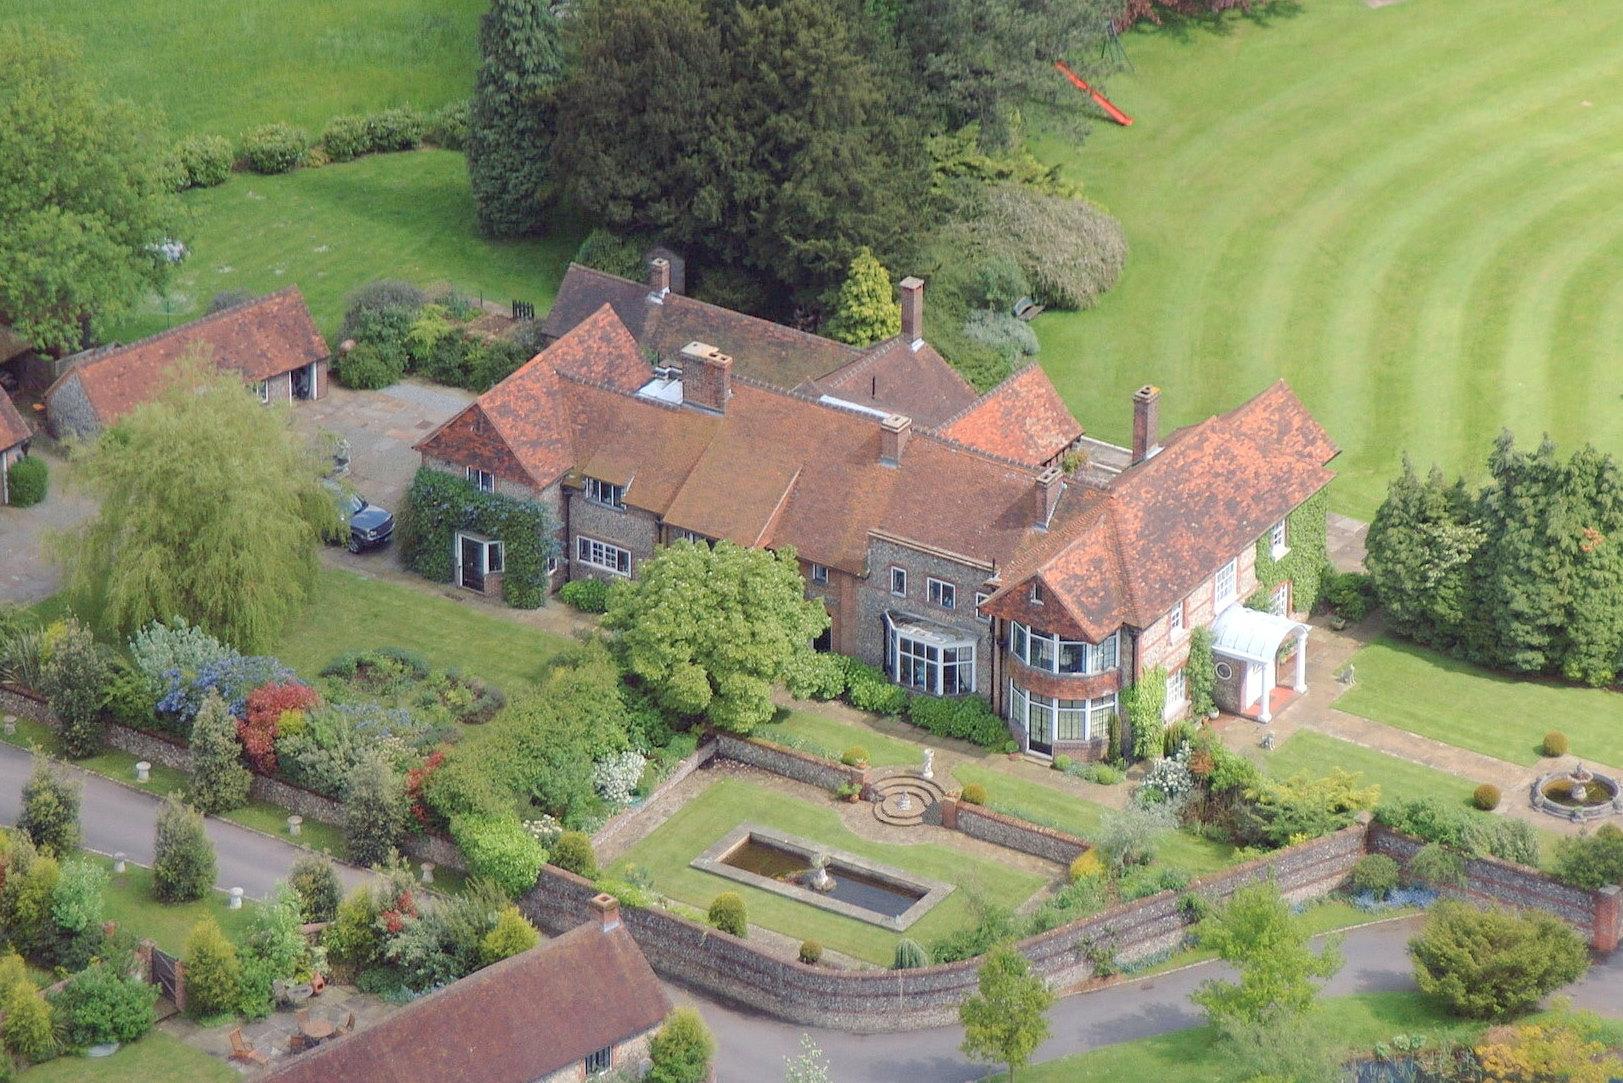 7 Bedroom Detached House For Sale In Kingswood